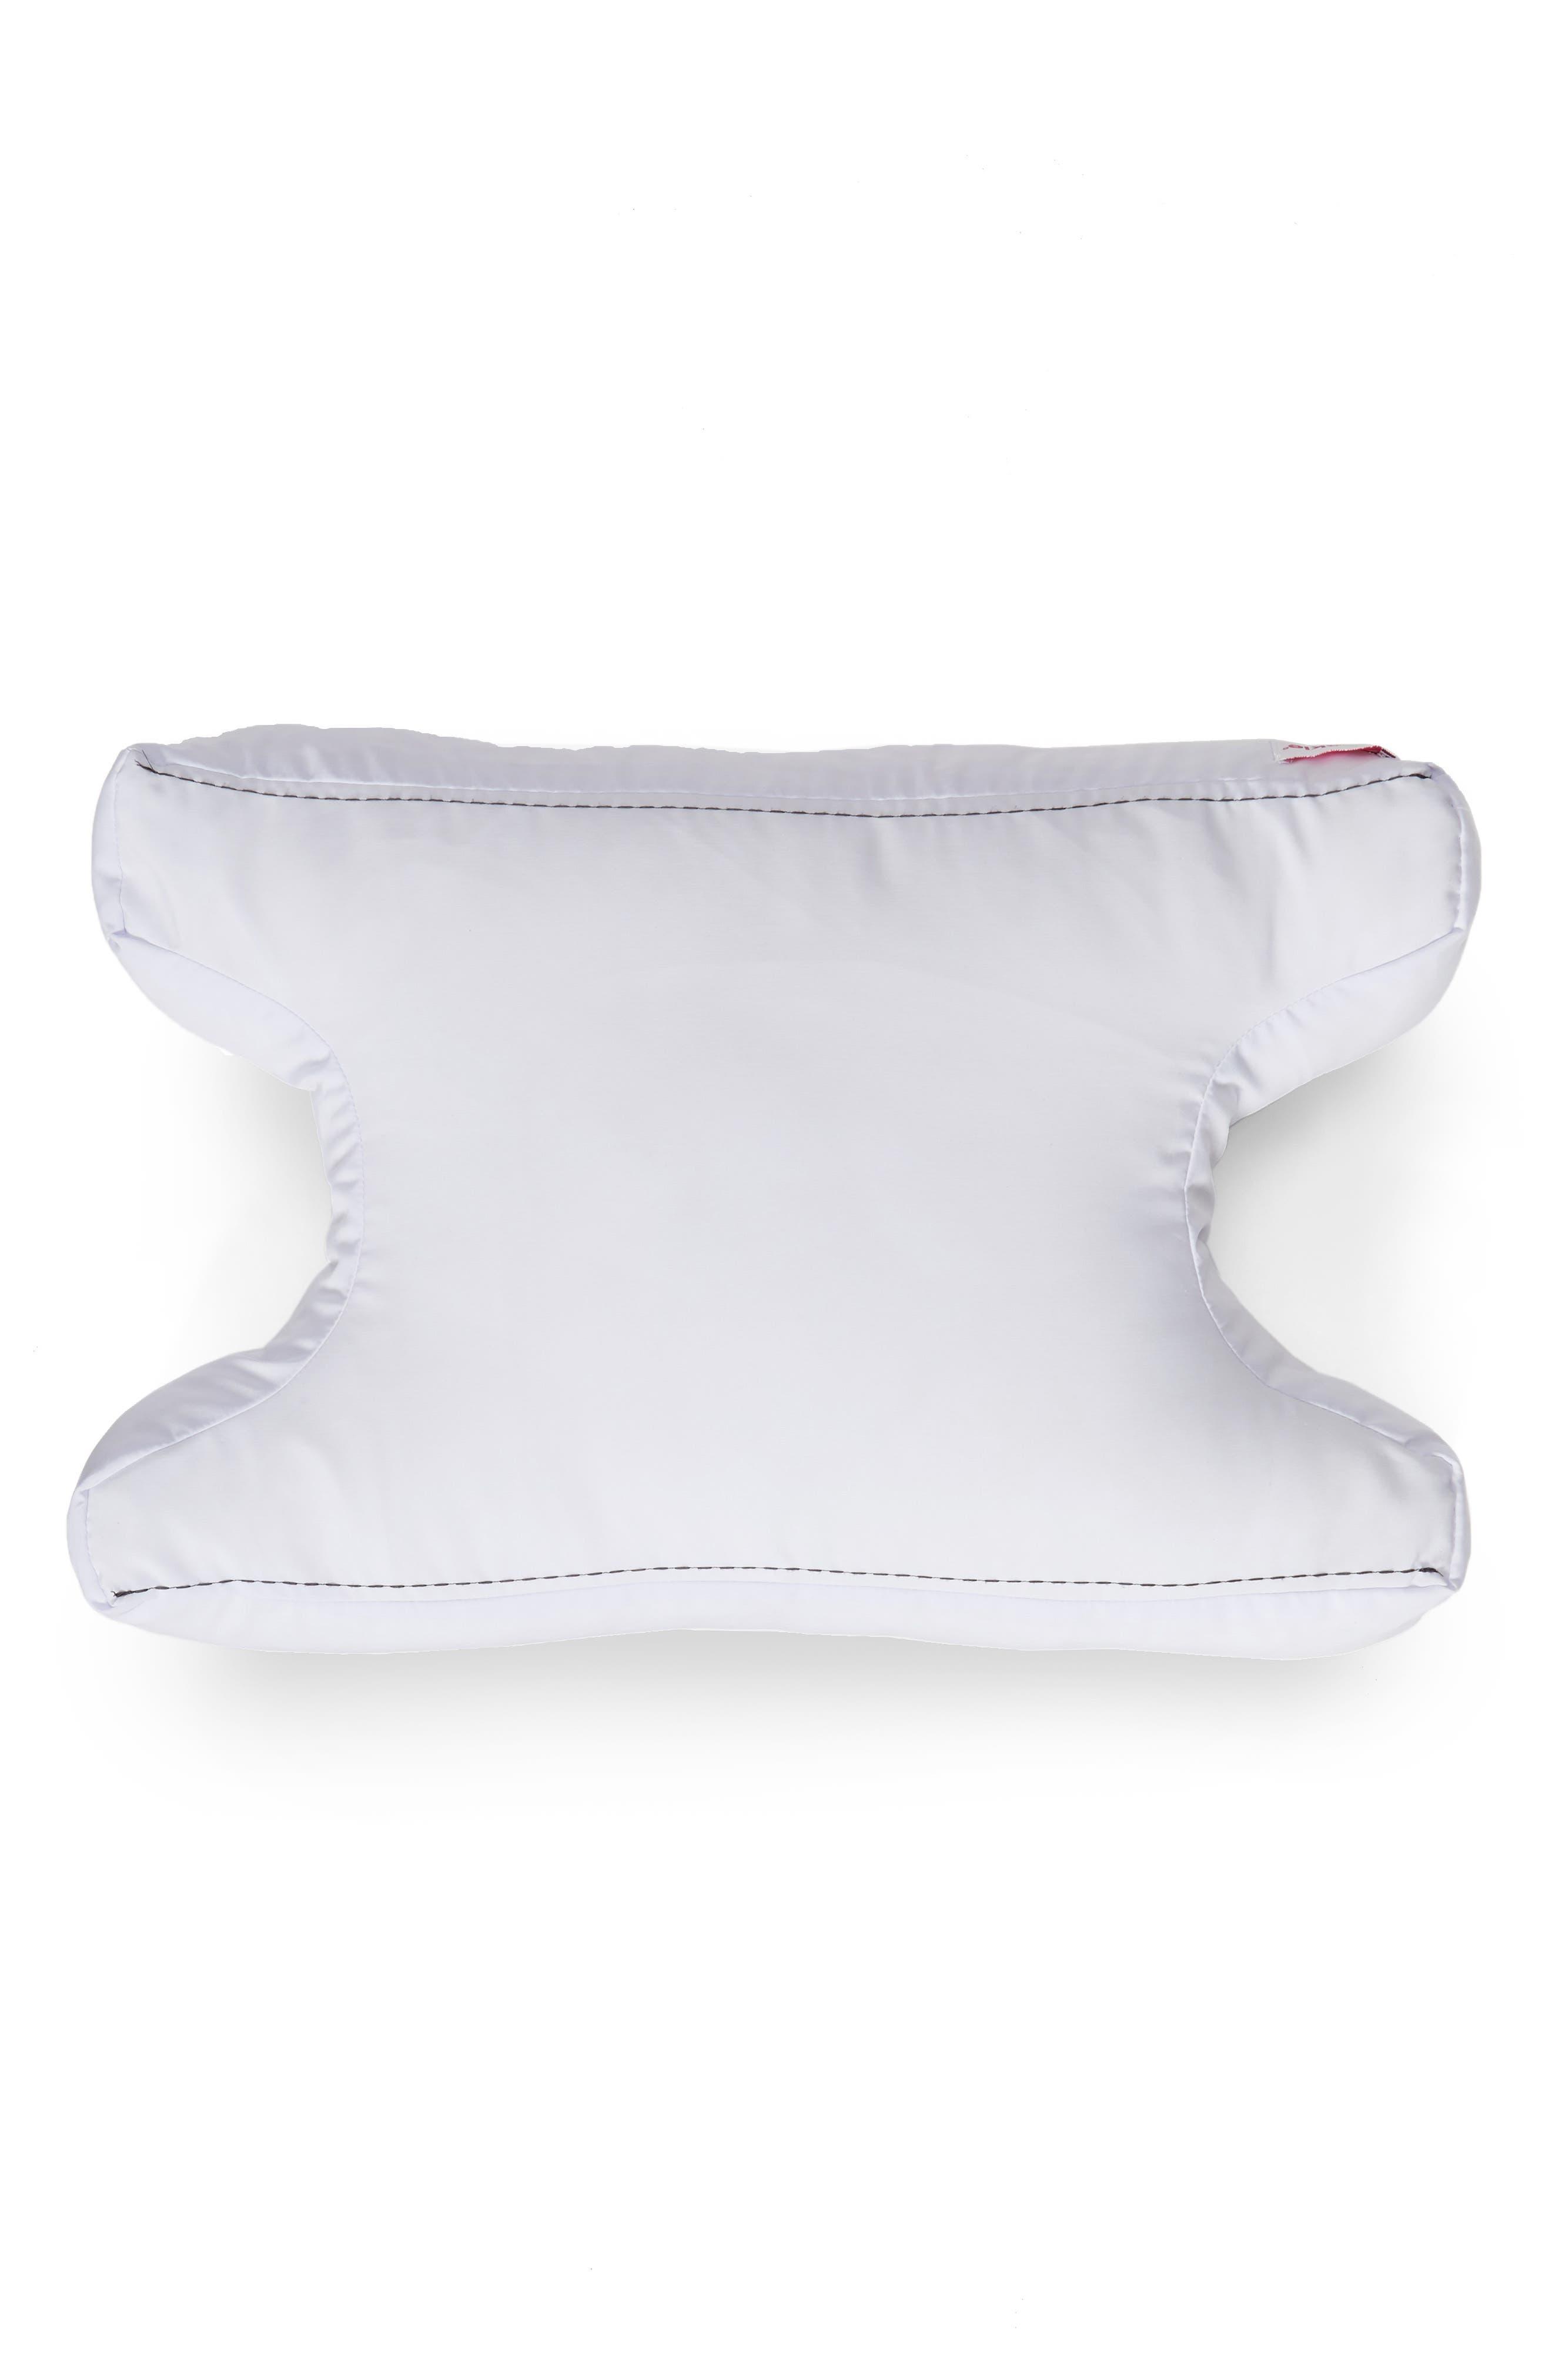 Beauty Pillow,                         Main,                         color, White